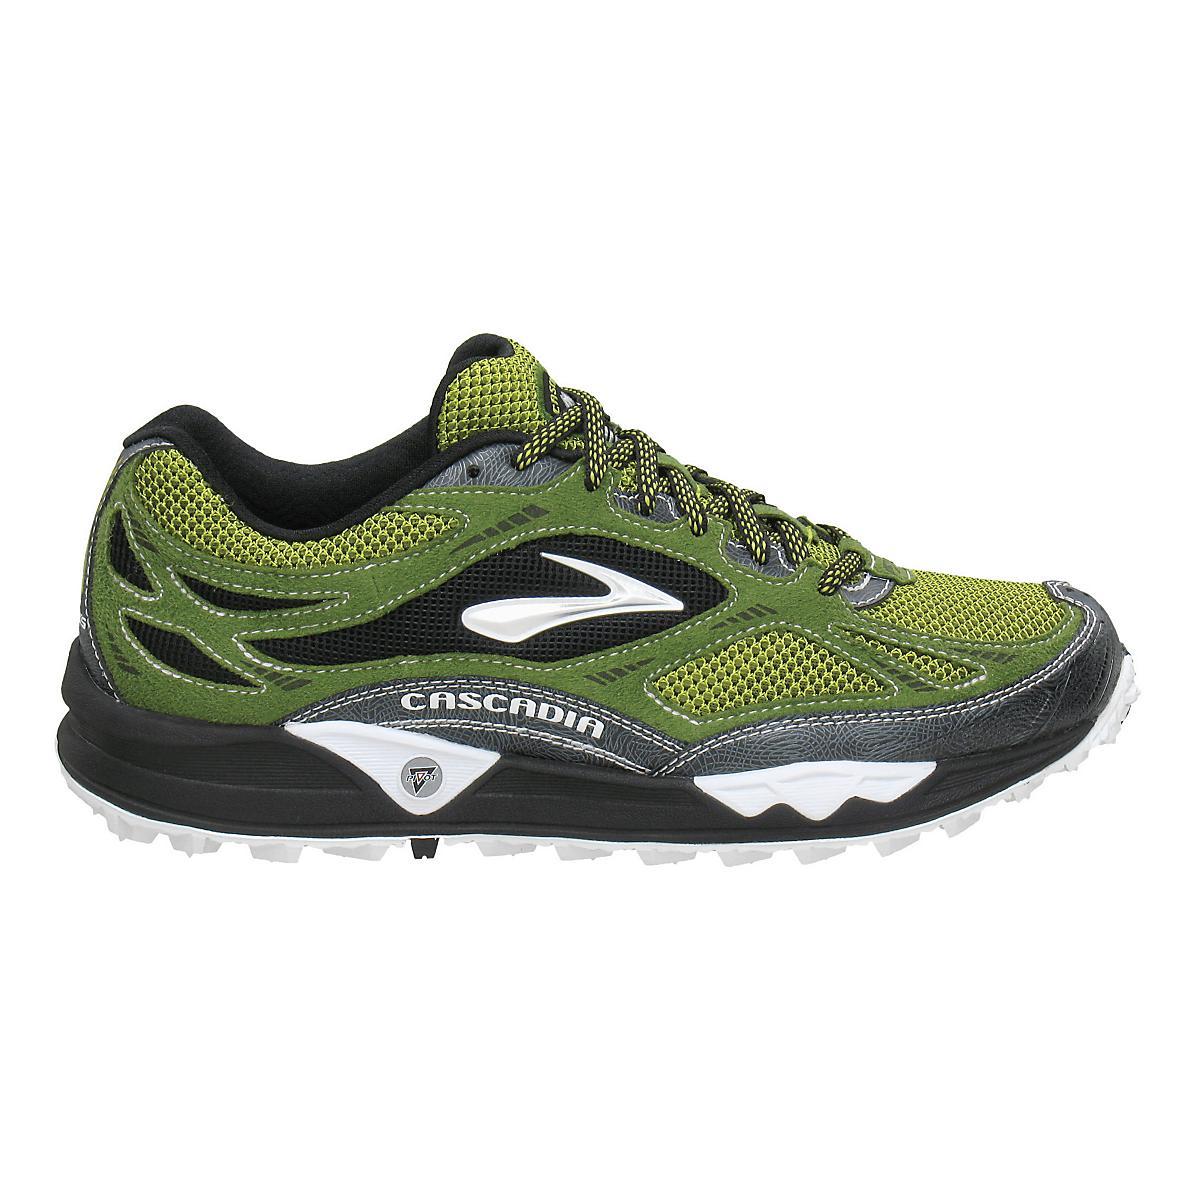 f1fad340793 Mens Brooks Cascadia 5 Trail Running Shoe at Road Runner Sports